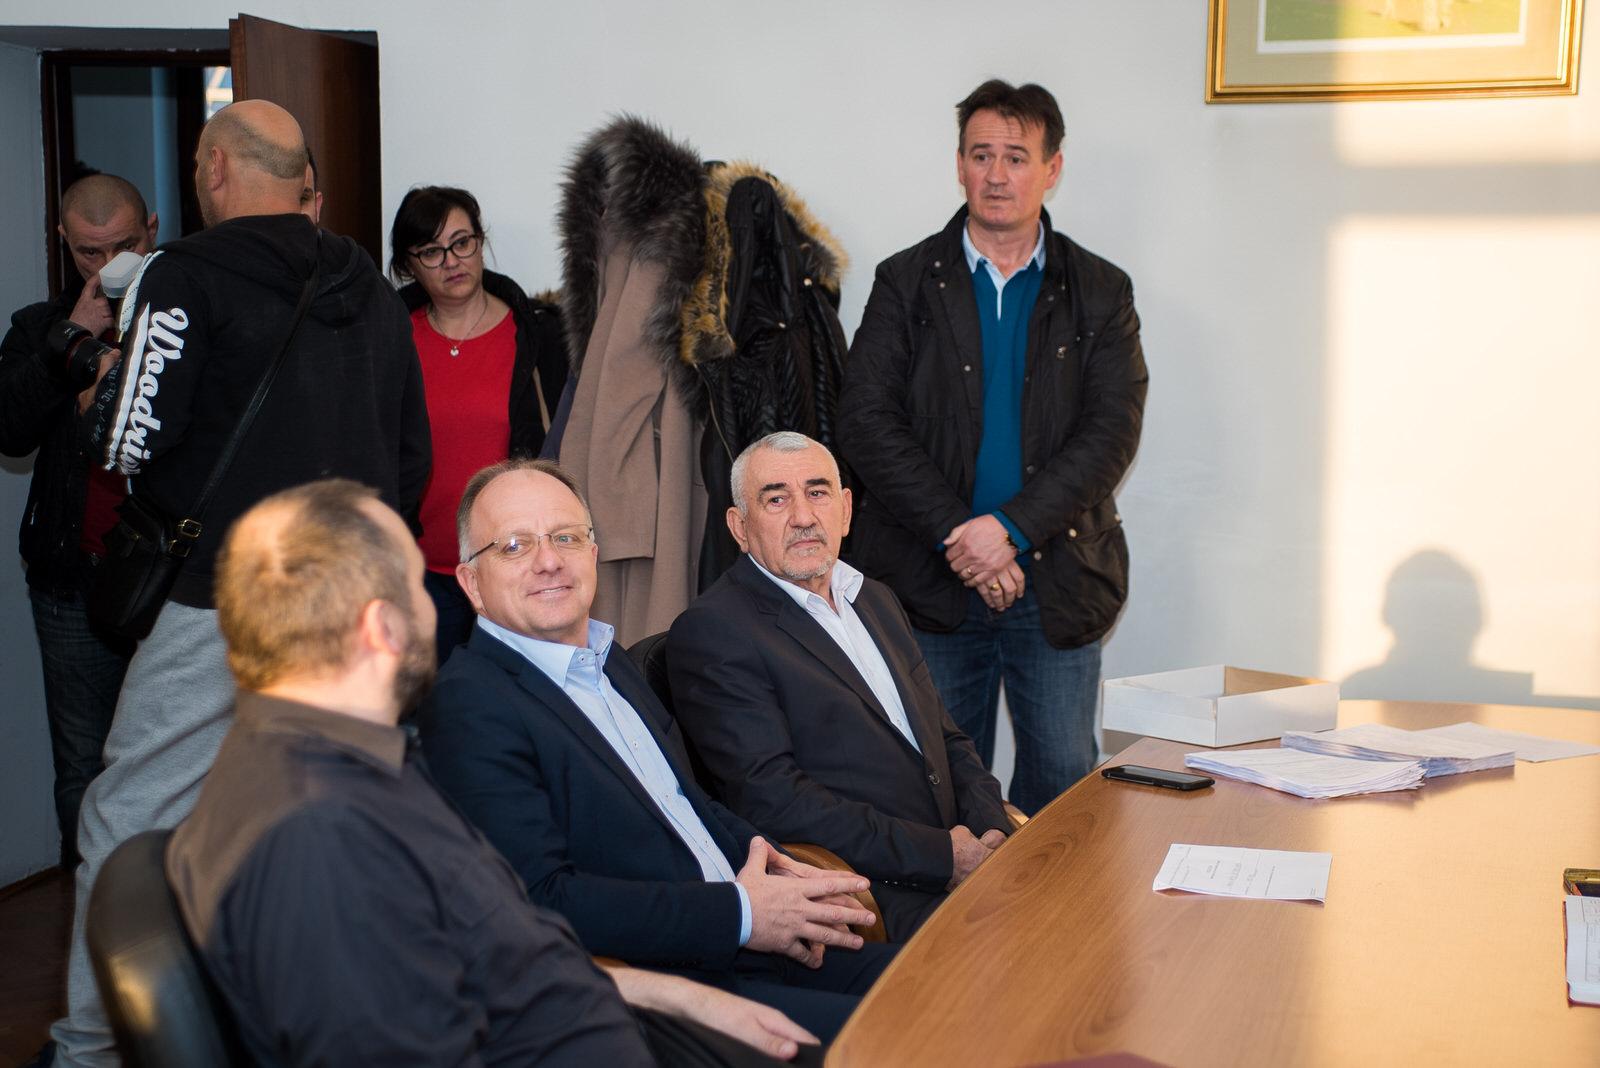 likaclub_politika-gospić_2019_bura-promjena-10